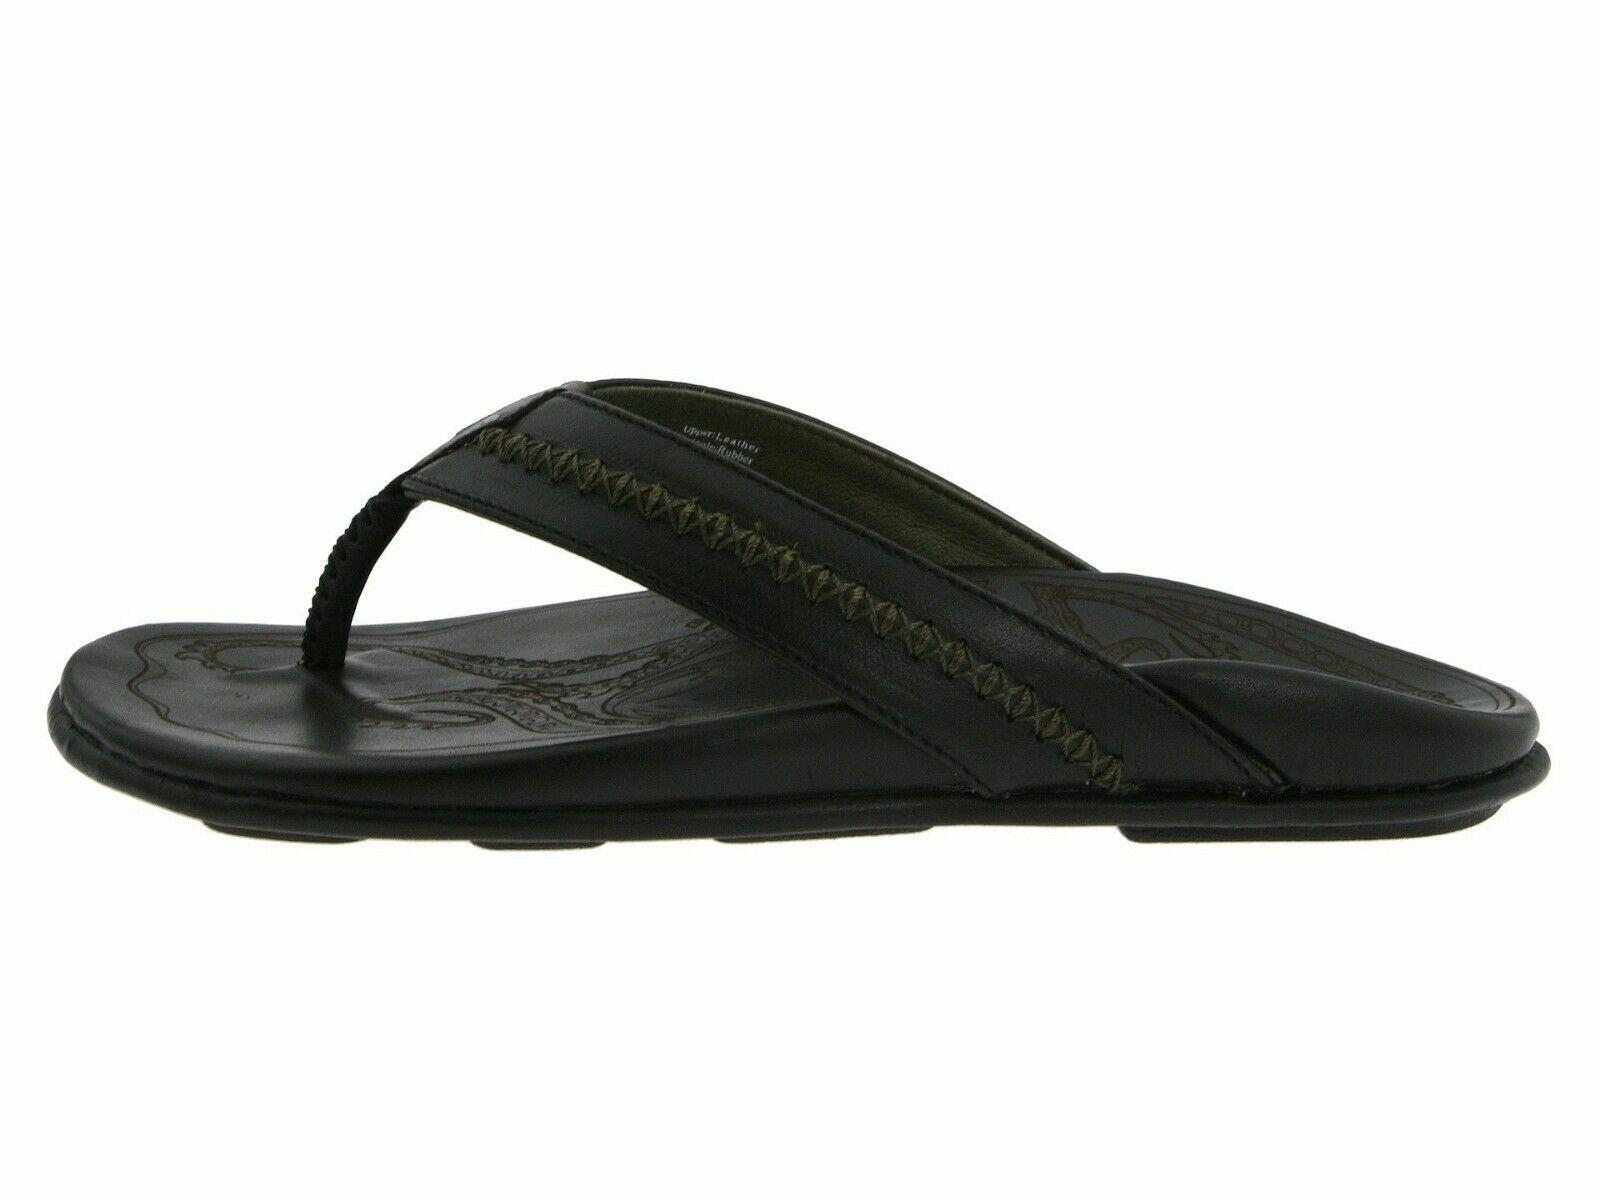 Olukai mea ola Negra Sandalia de cuero superior de hombre 10138-4040